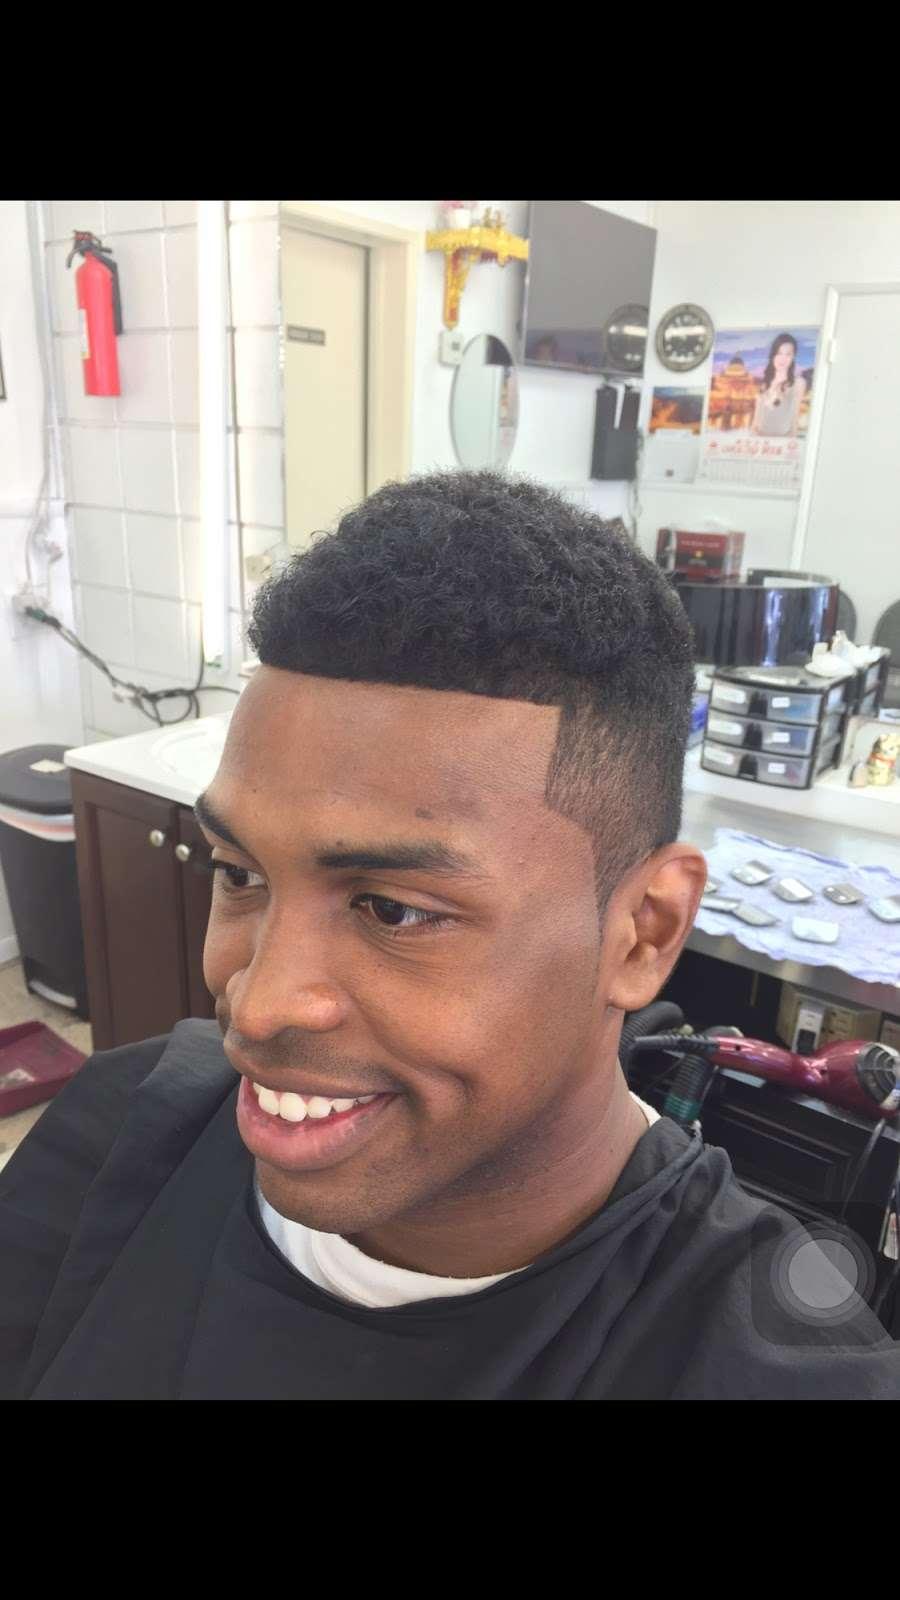 La Mesa Barber Shop - hair care  | Photo 3 of 10 | Address: 8515 La Mesa Blvd, La Mesa, CA 91942, USA | Phone: (619) 908-9557